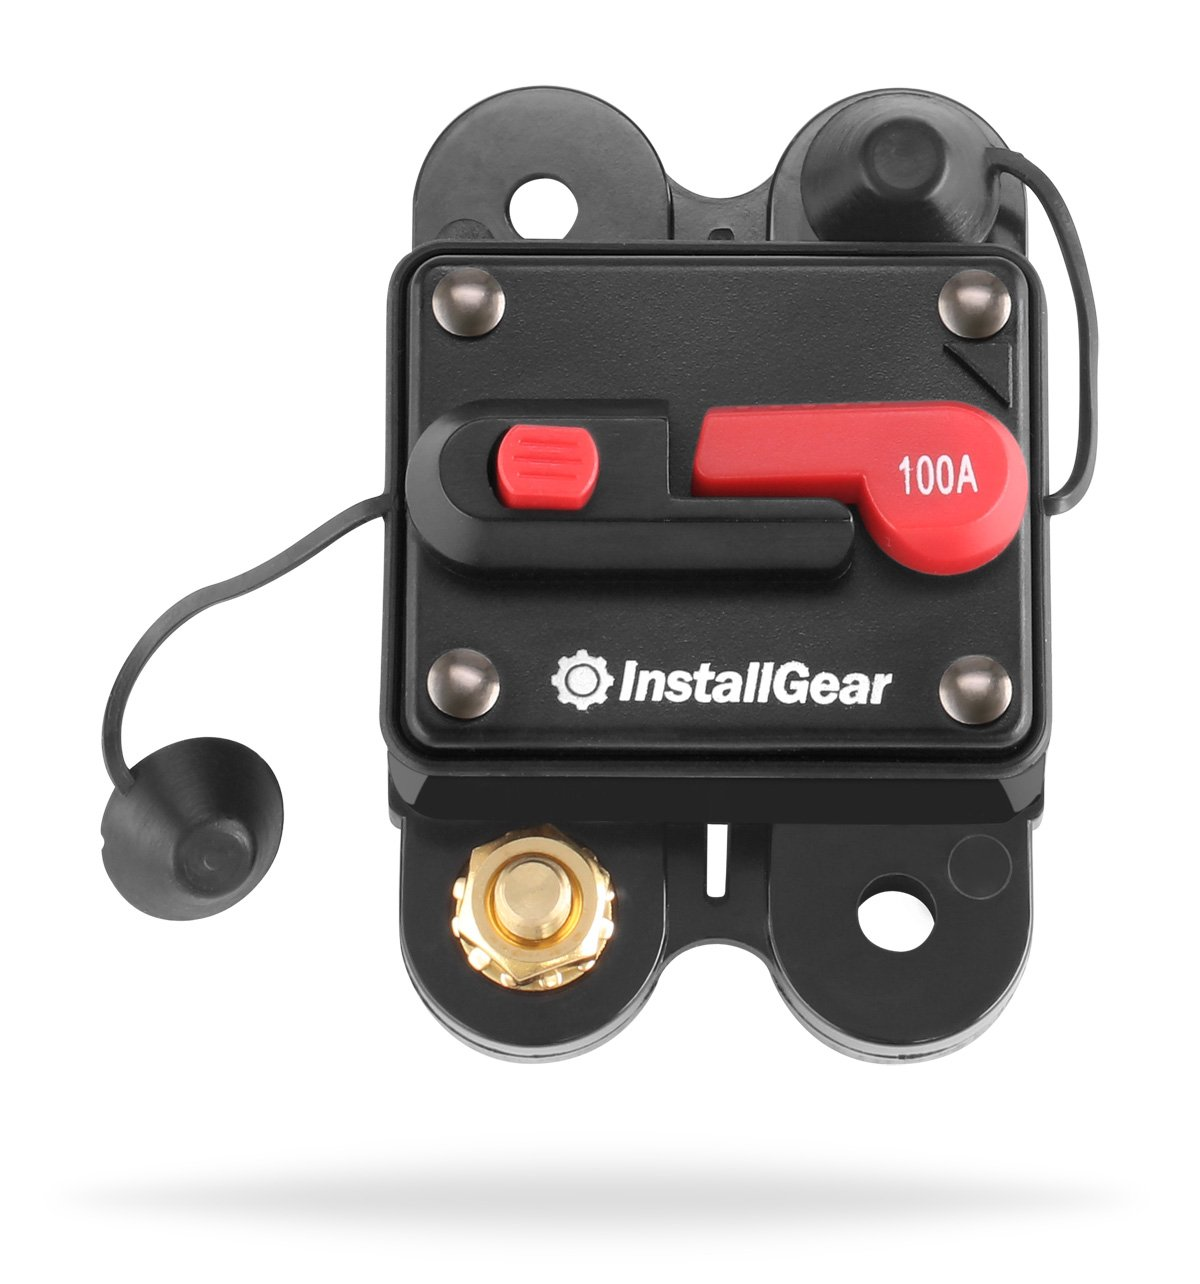 InstallGear 250 Amp Manual Reset Circuit Breaker